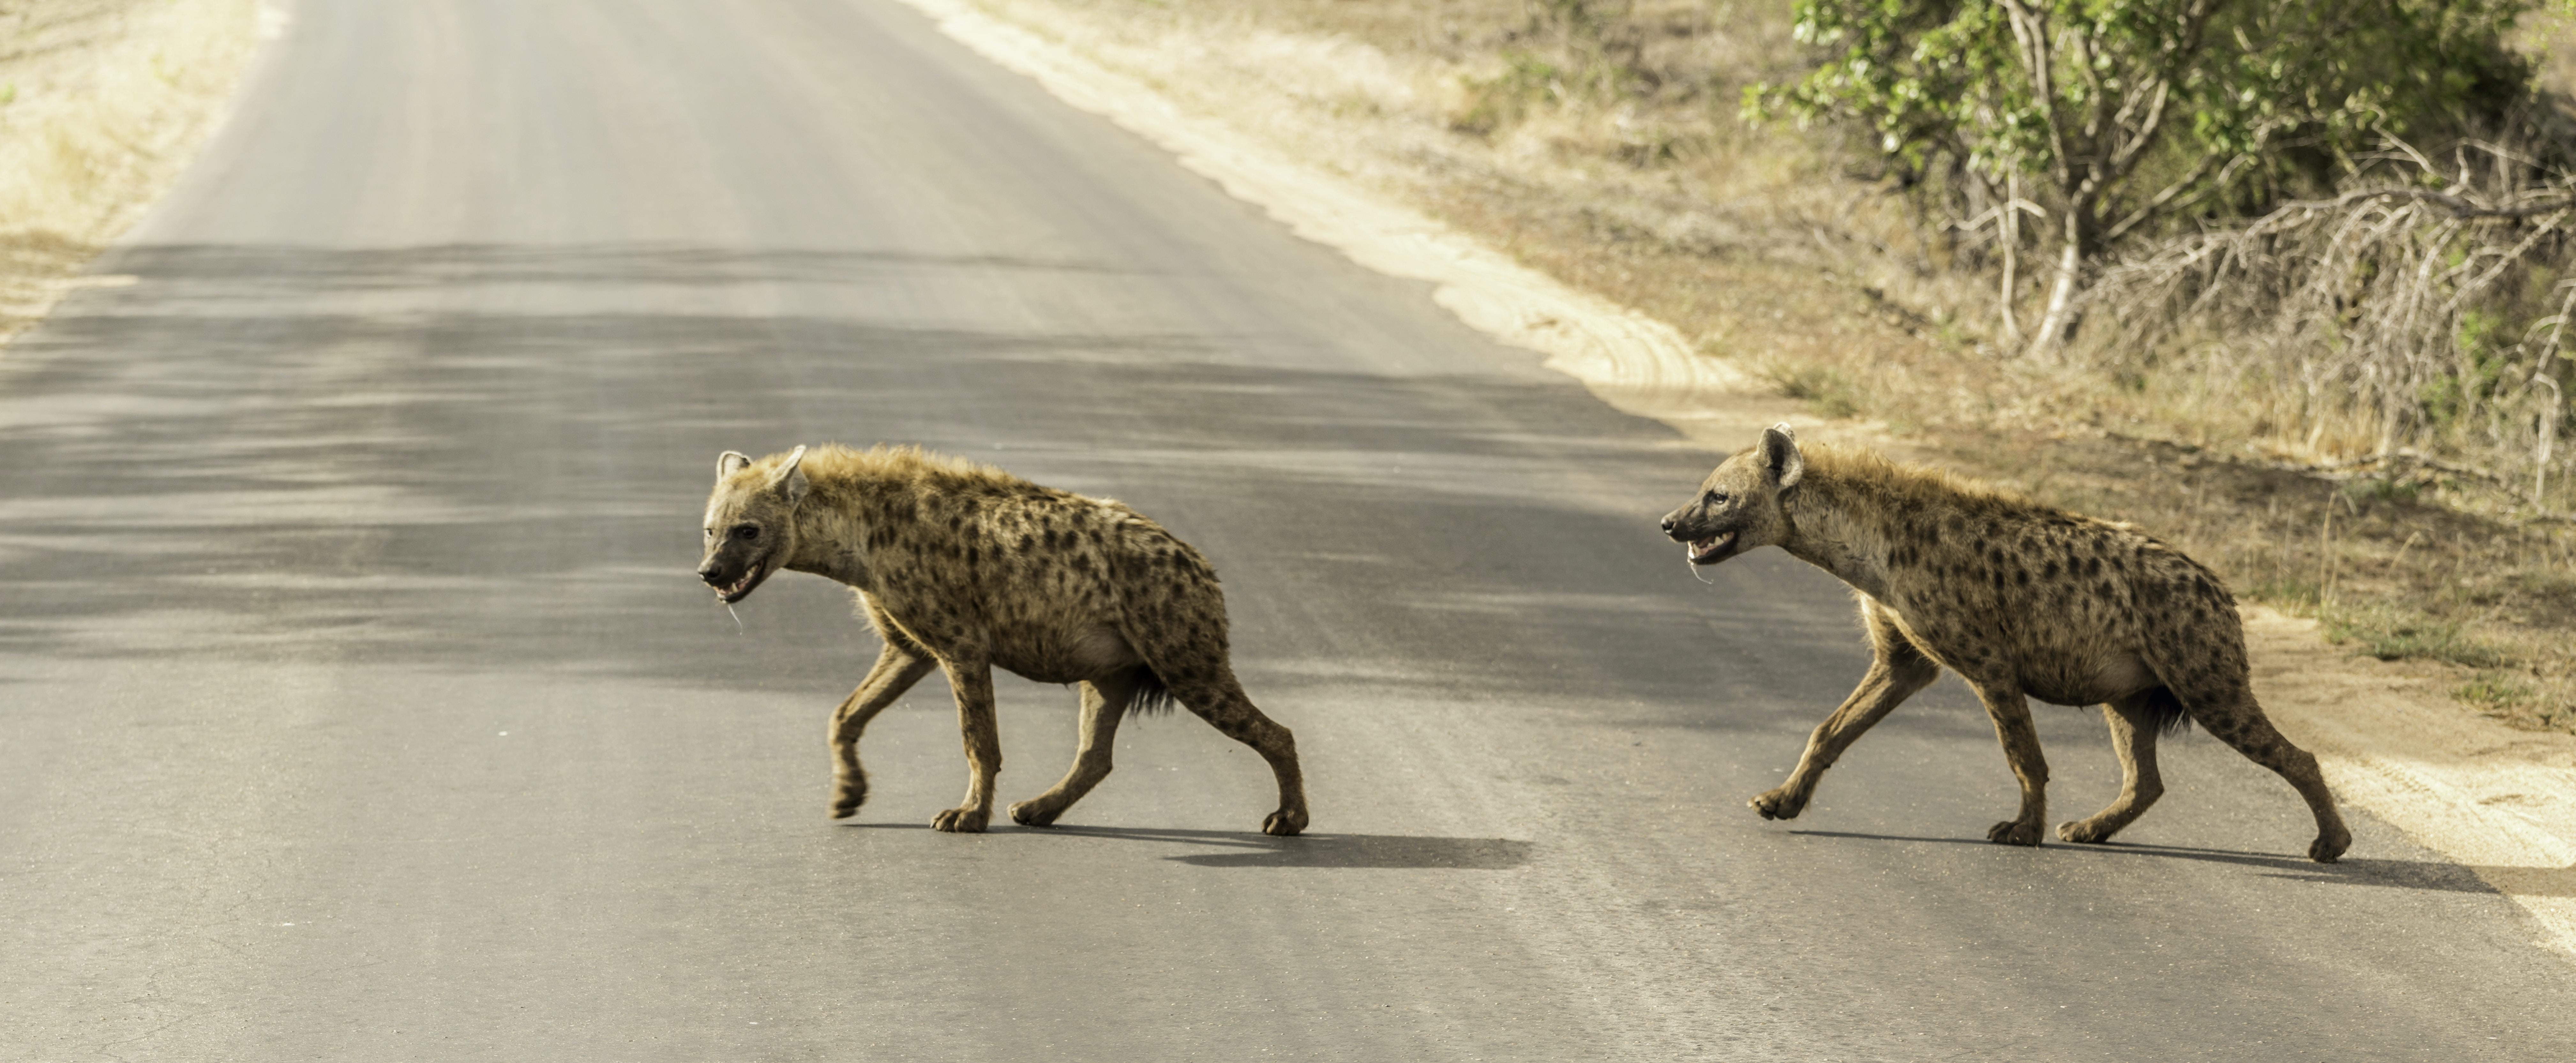 two hyena crossing concrete road